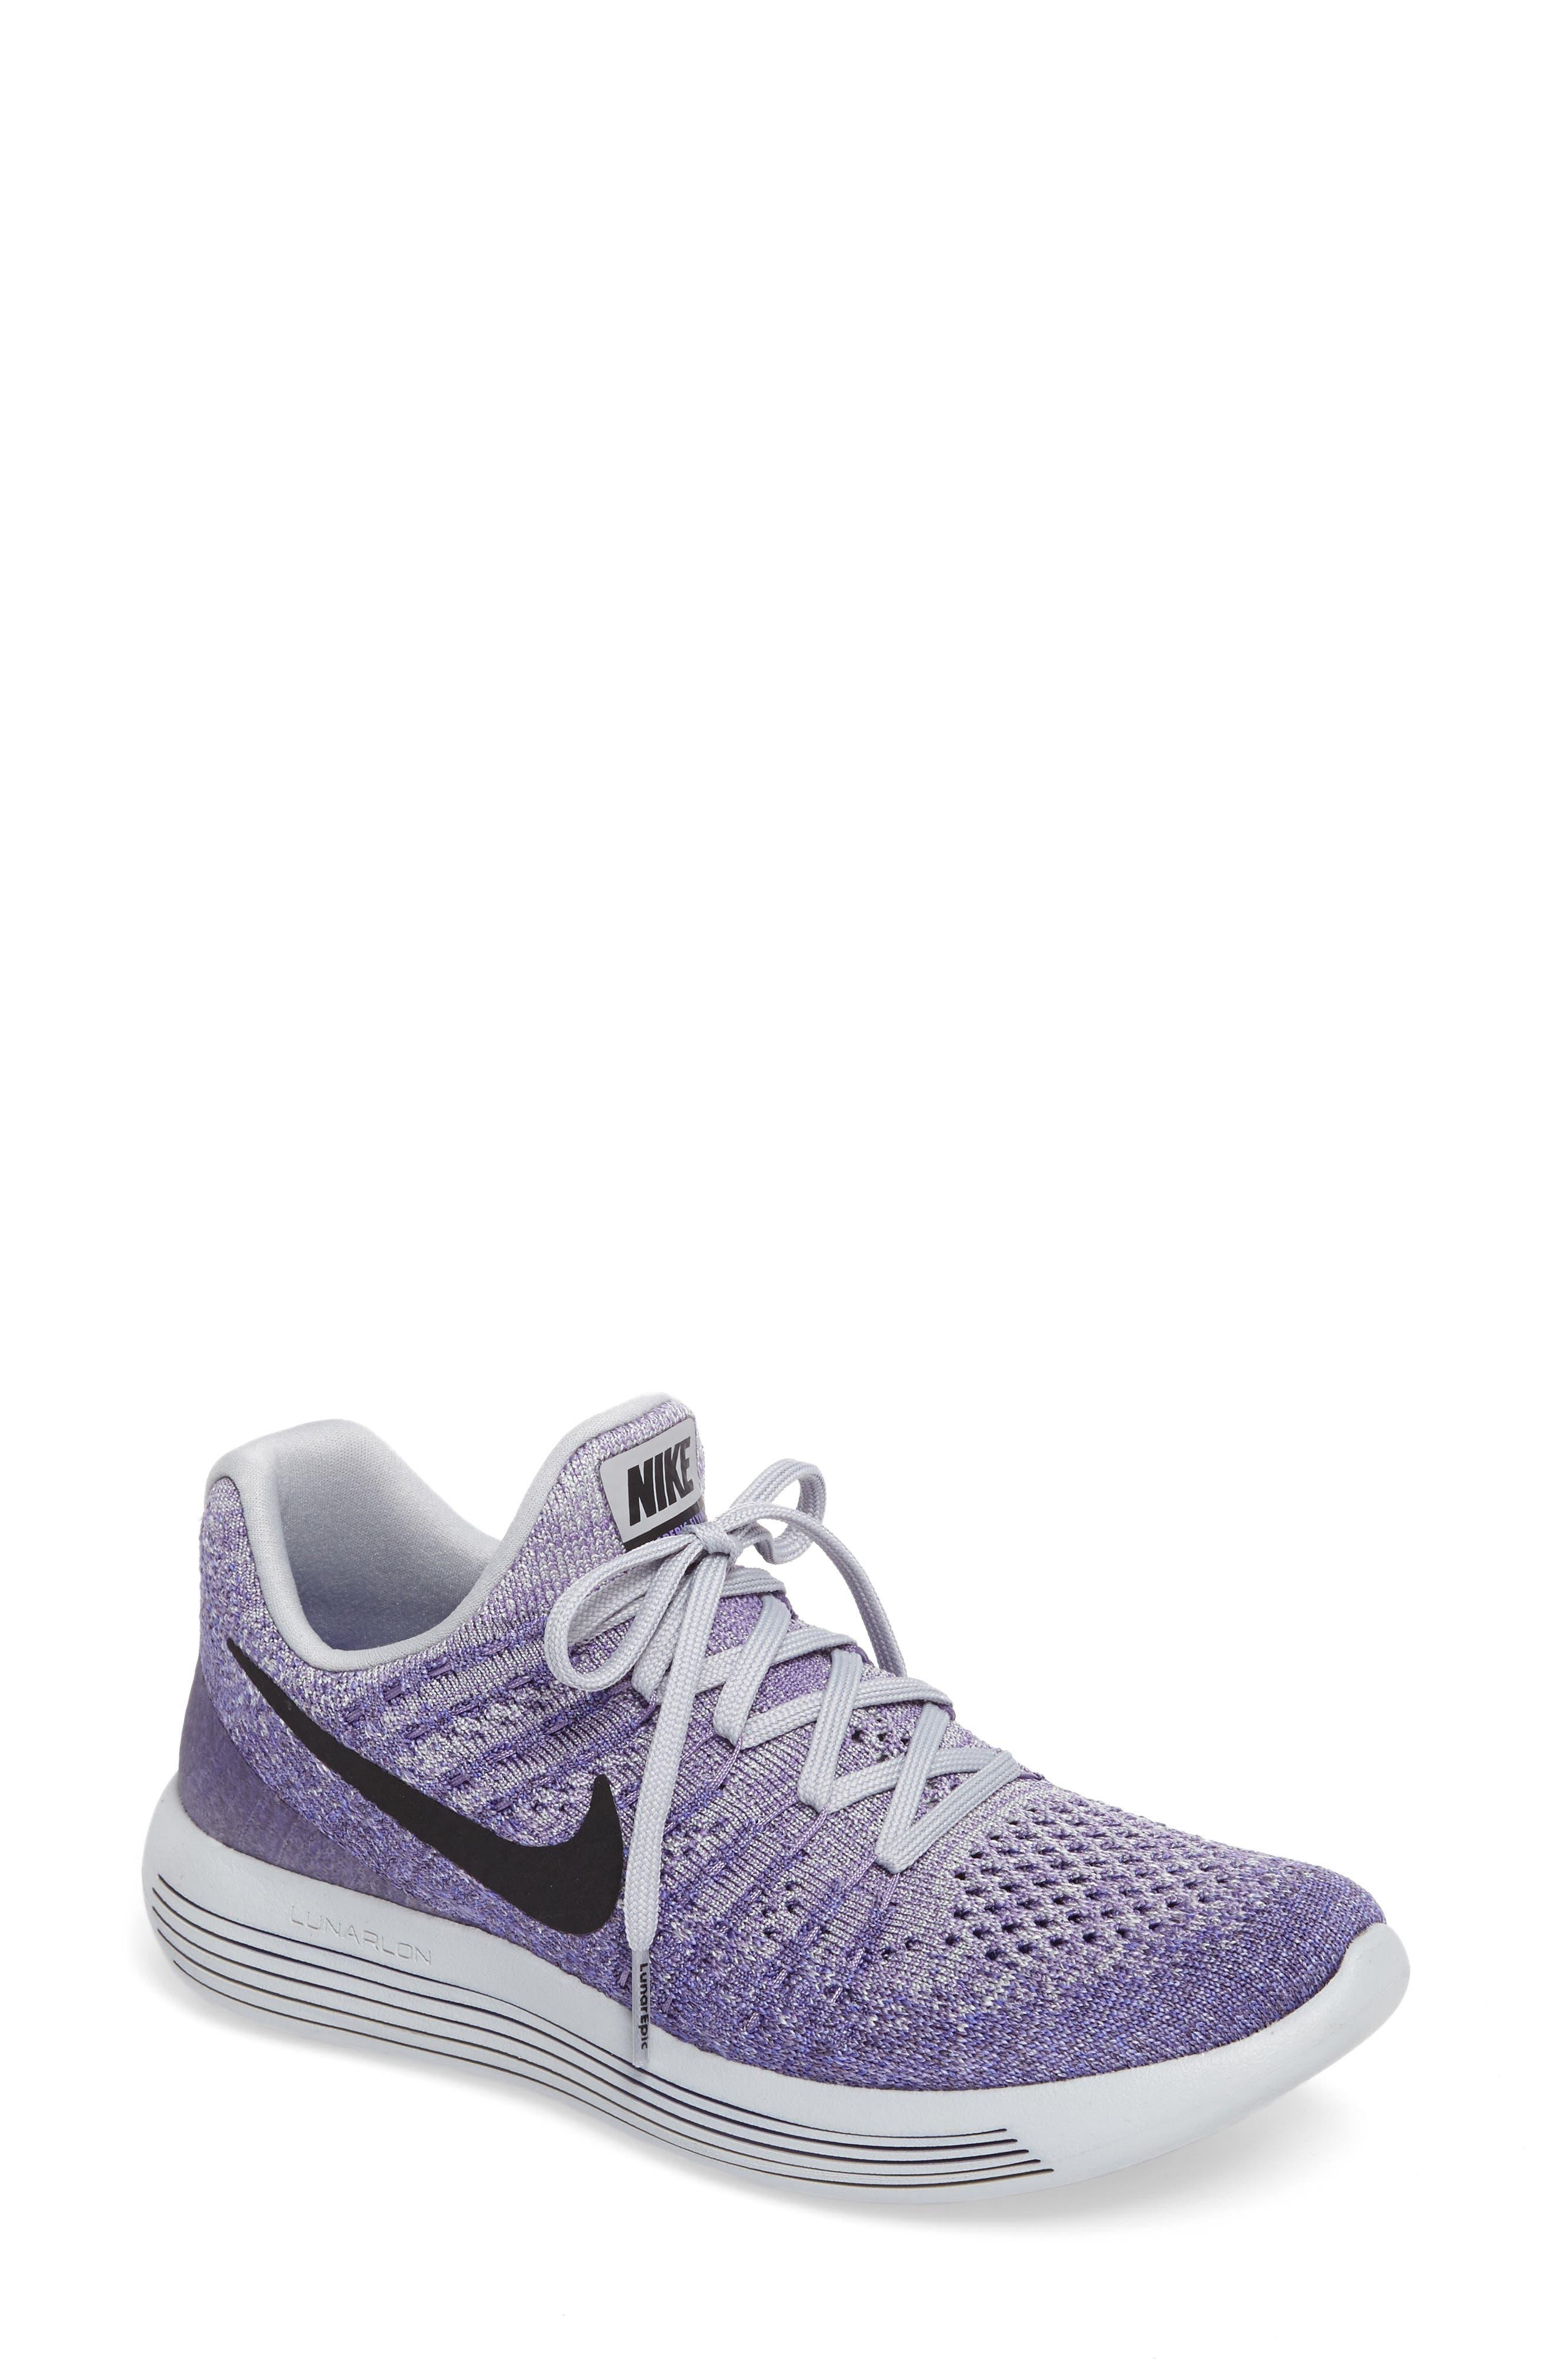 Main Image - Nike LunarEpic Low Flyknit 2 Running Shoe (Women)